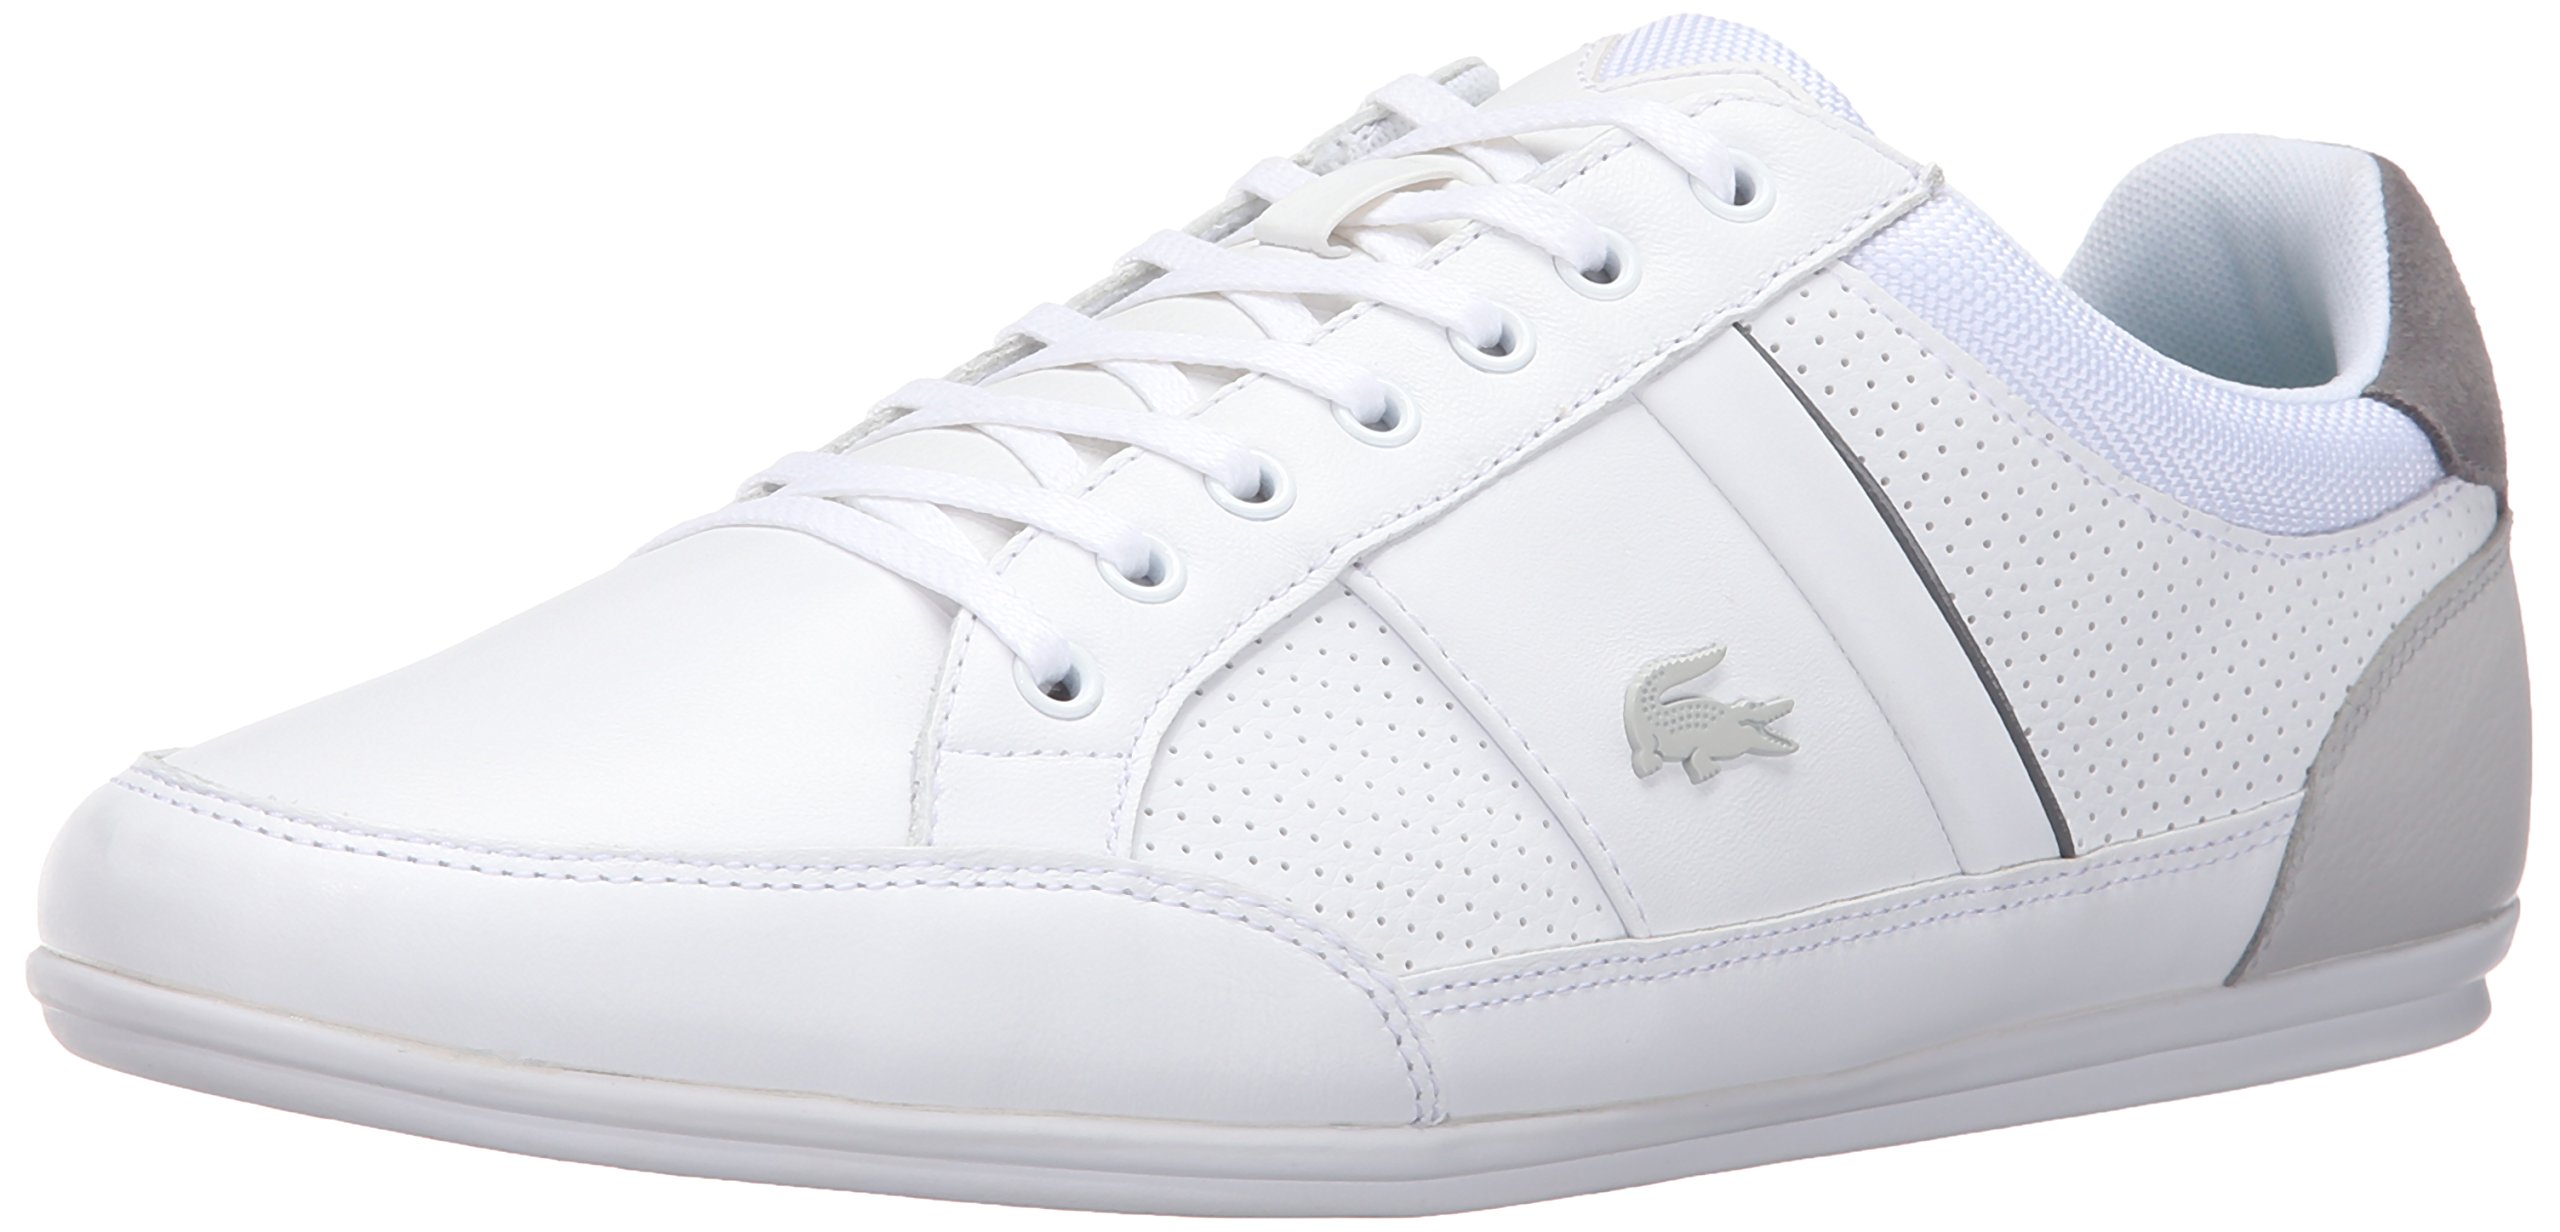 Lacoste Men's Chaymon 316 1 Cam Fashion Sneaker, White/Light Green, 11 M US